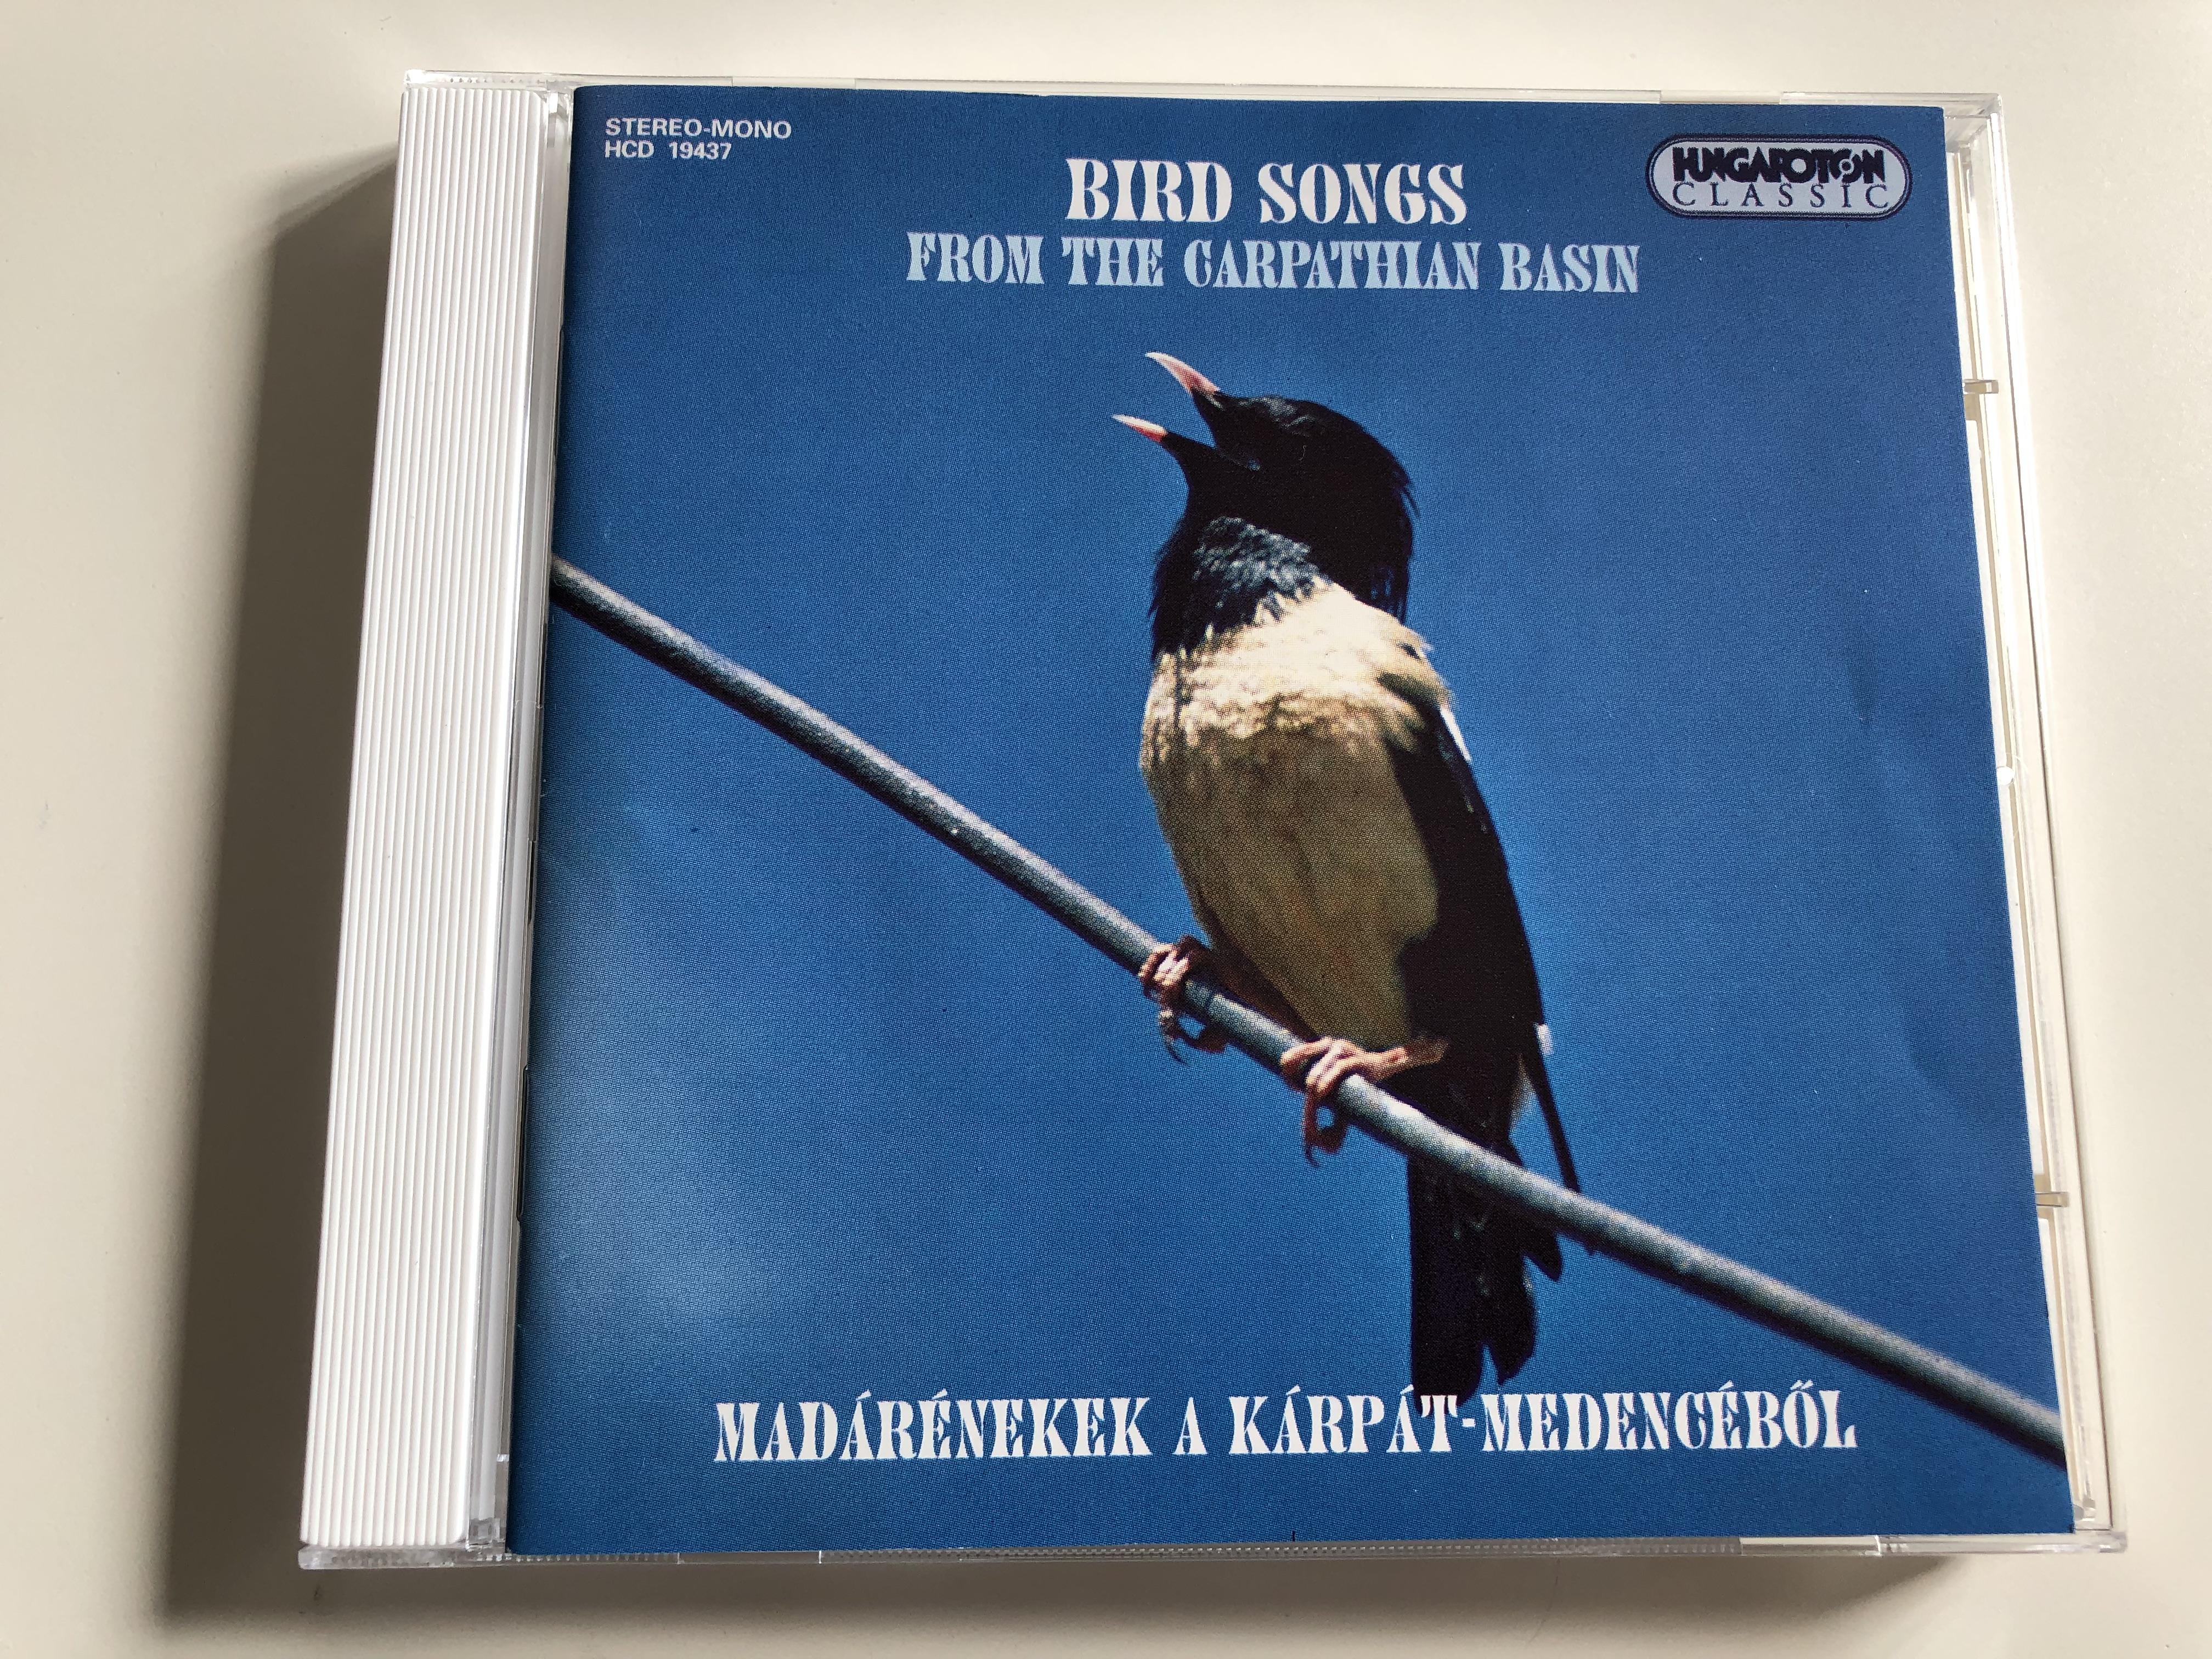 -bird-songs-from-the-carpathian-basin-recorded-by-dr.-mih-ly-orsz-g-mad-r-nekek-a-k-rp-t-medenc-b-l-hungaroton-classic-audio-cd-1996-hcd-19437-1-.jpg